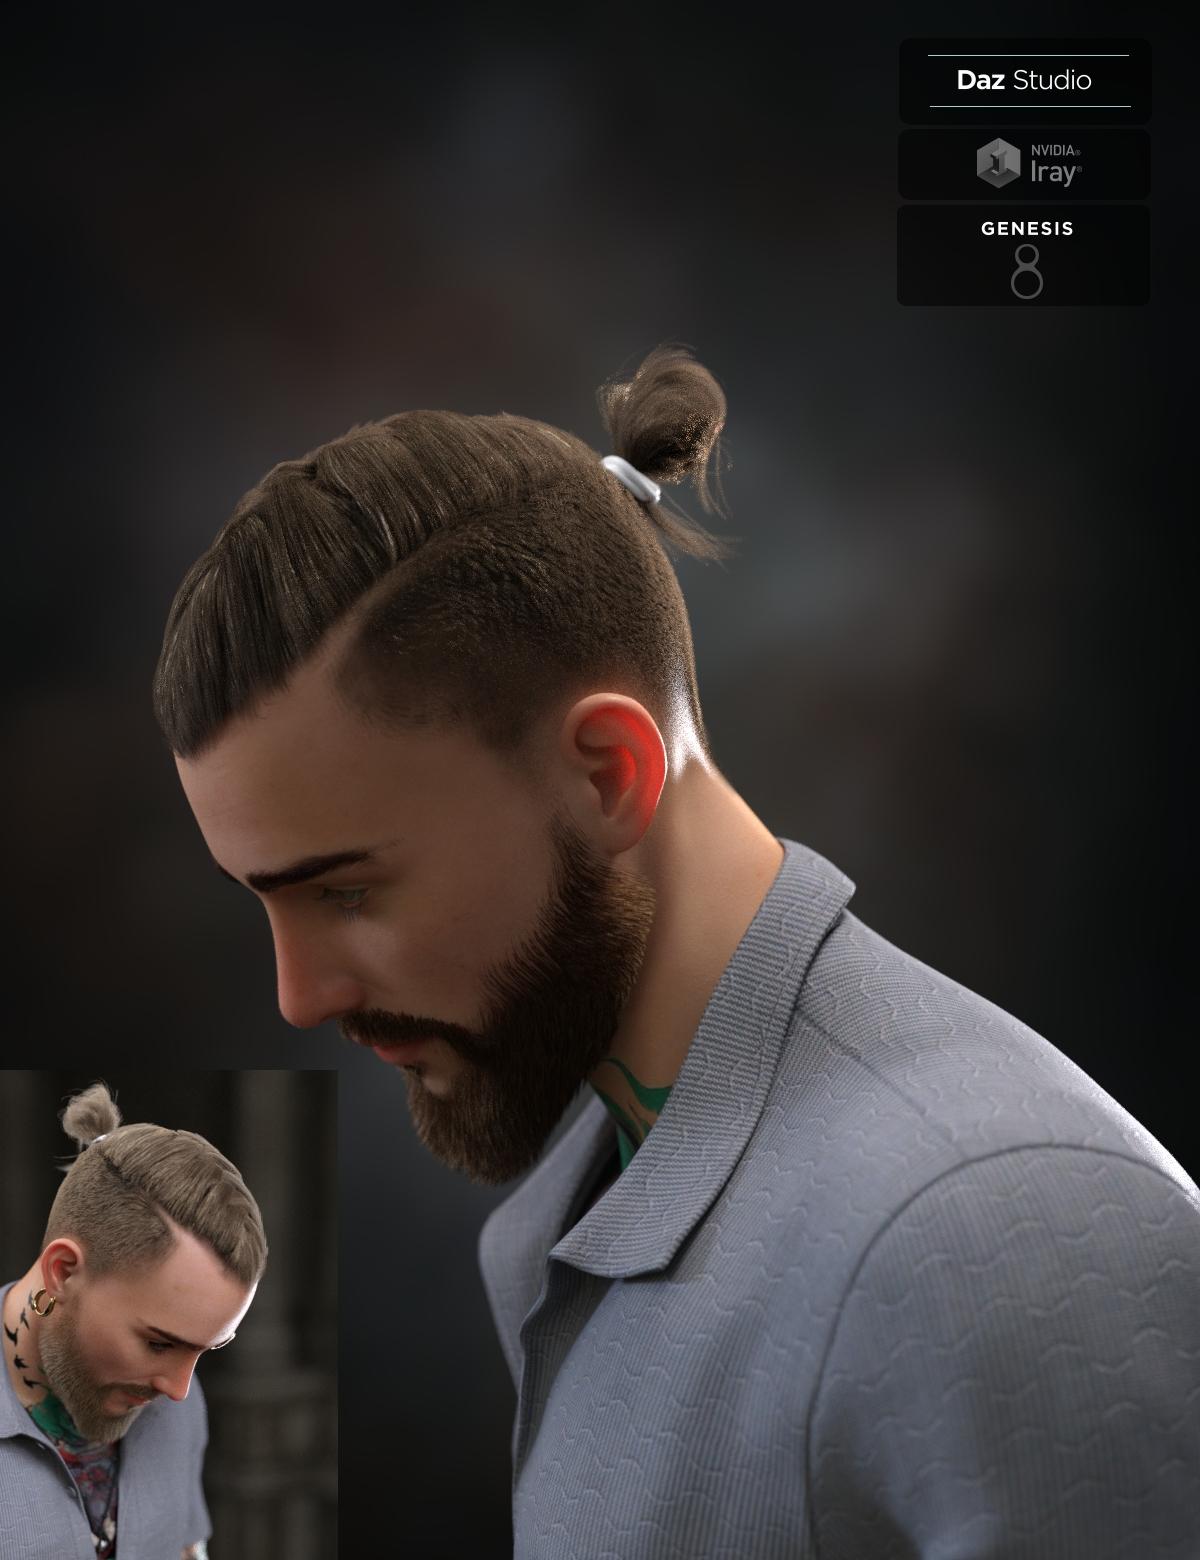 Koryan Top Braid Hair and Beard Set for Genesis 8 Male(s)